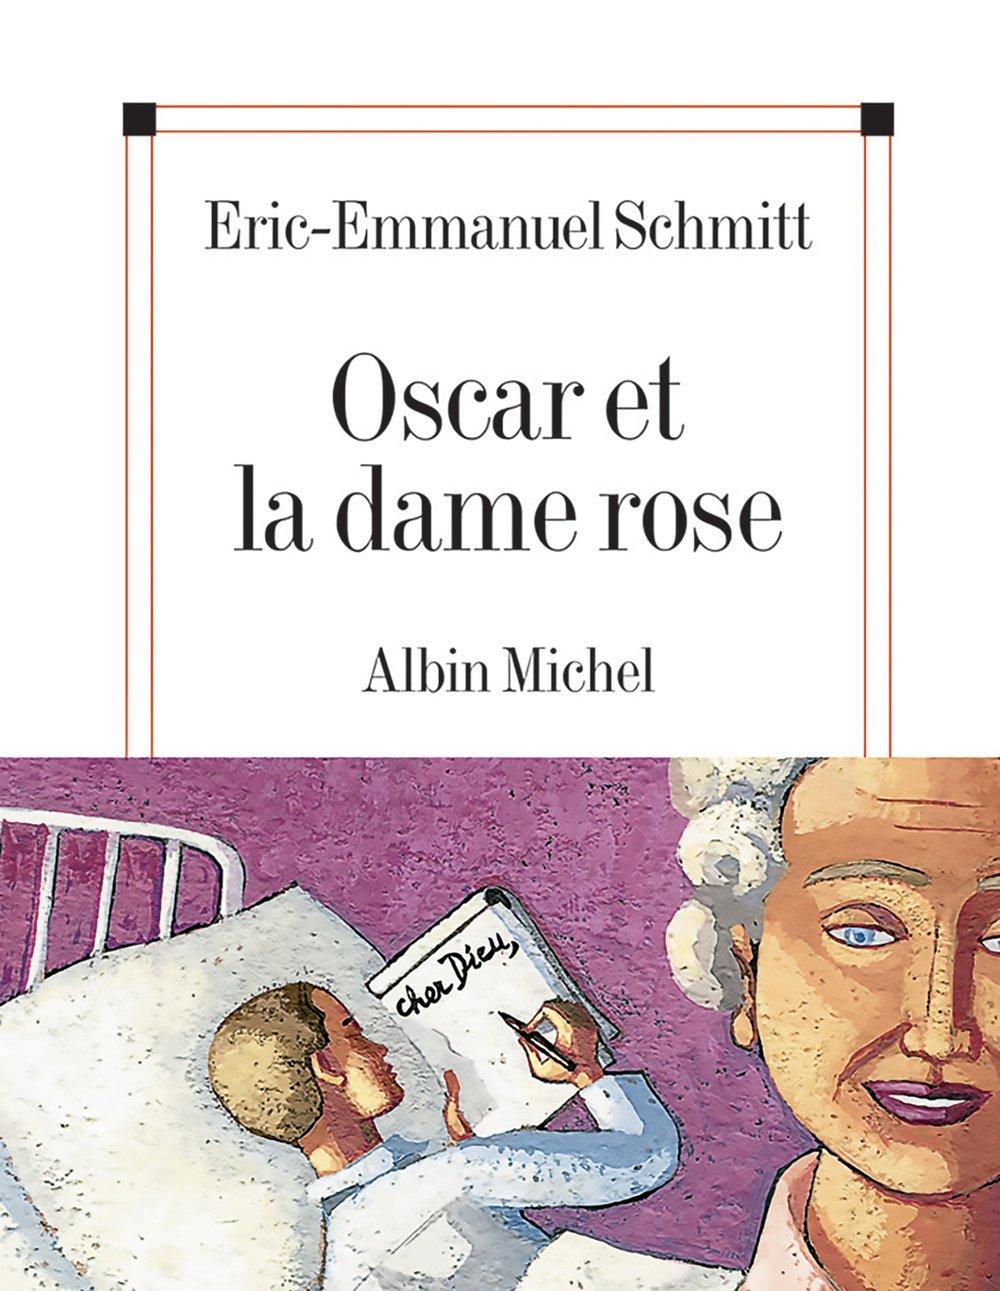 oscar-et-la-dame-rose-eric-emmanuel-schmitt-culturclub-newsletter.jpg